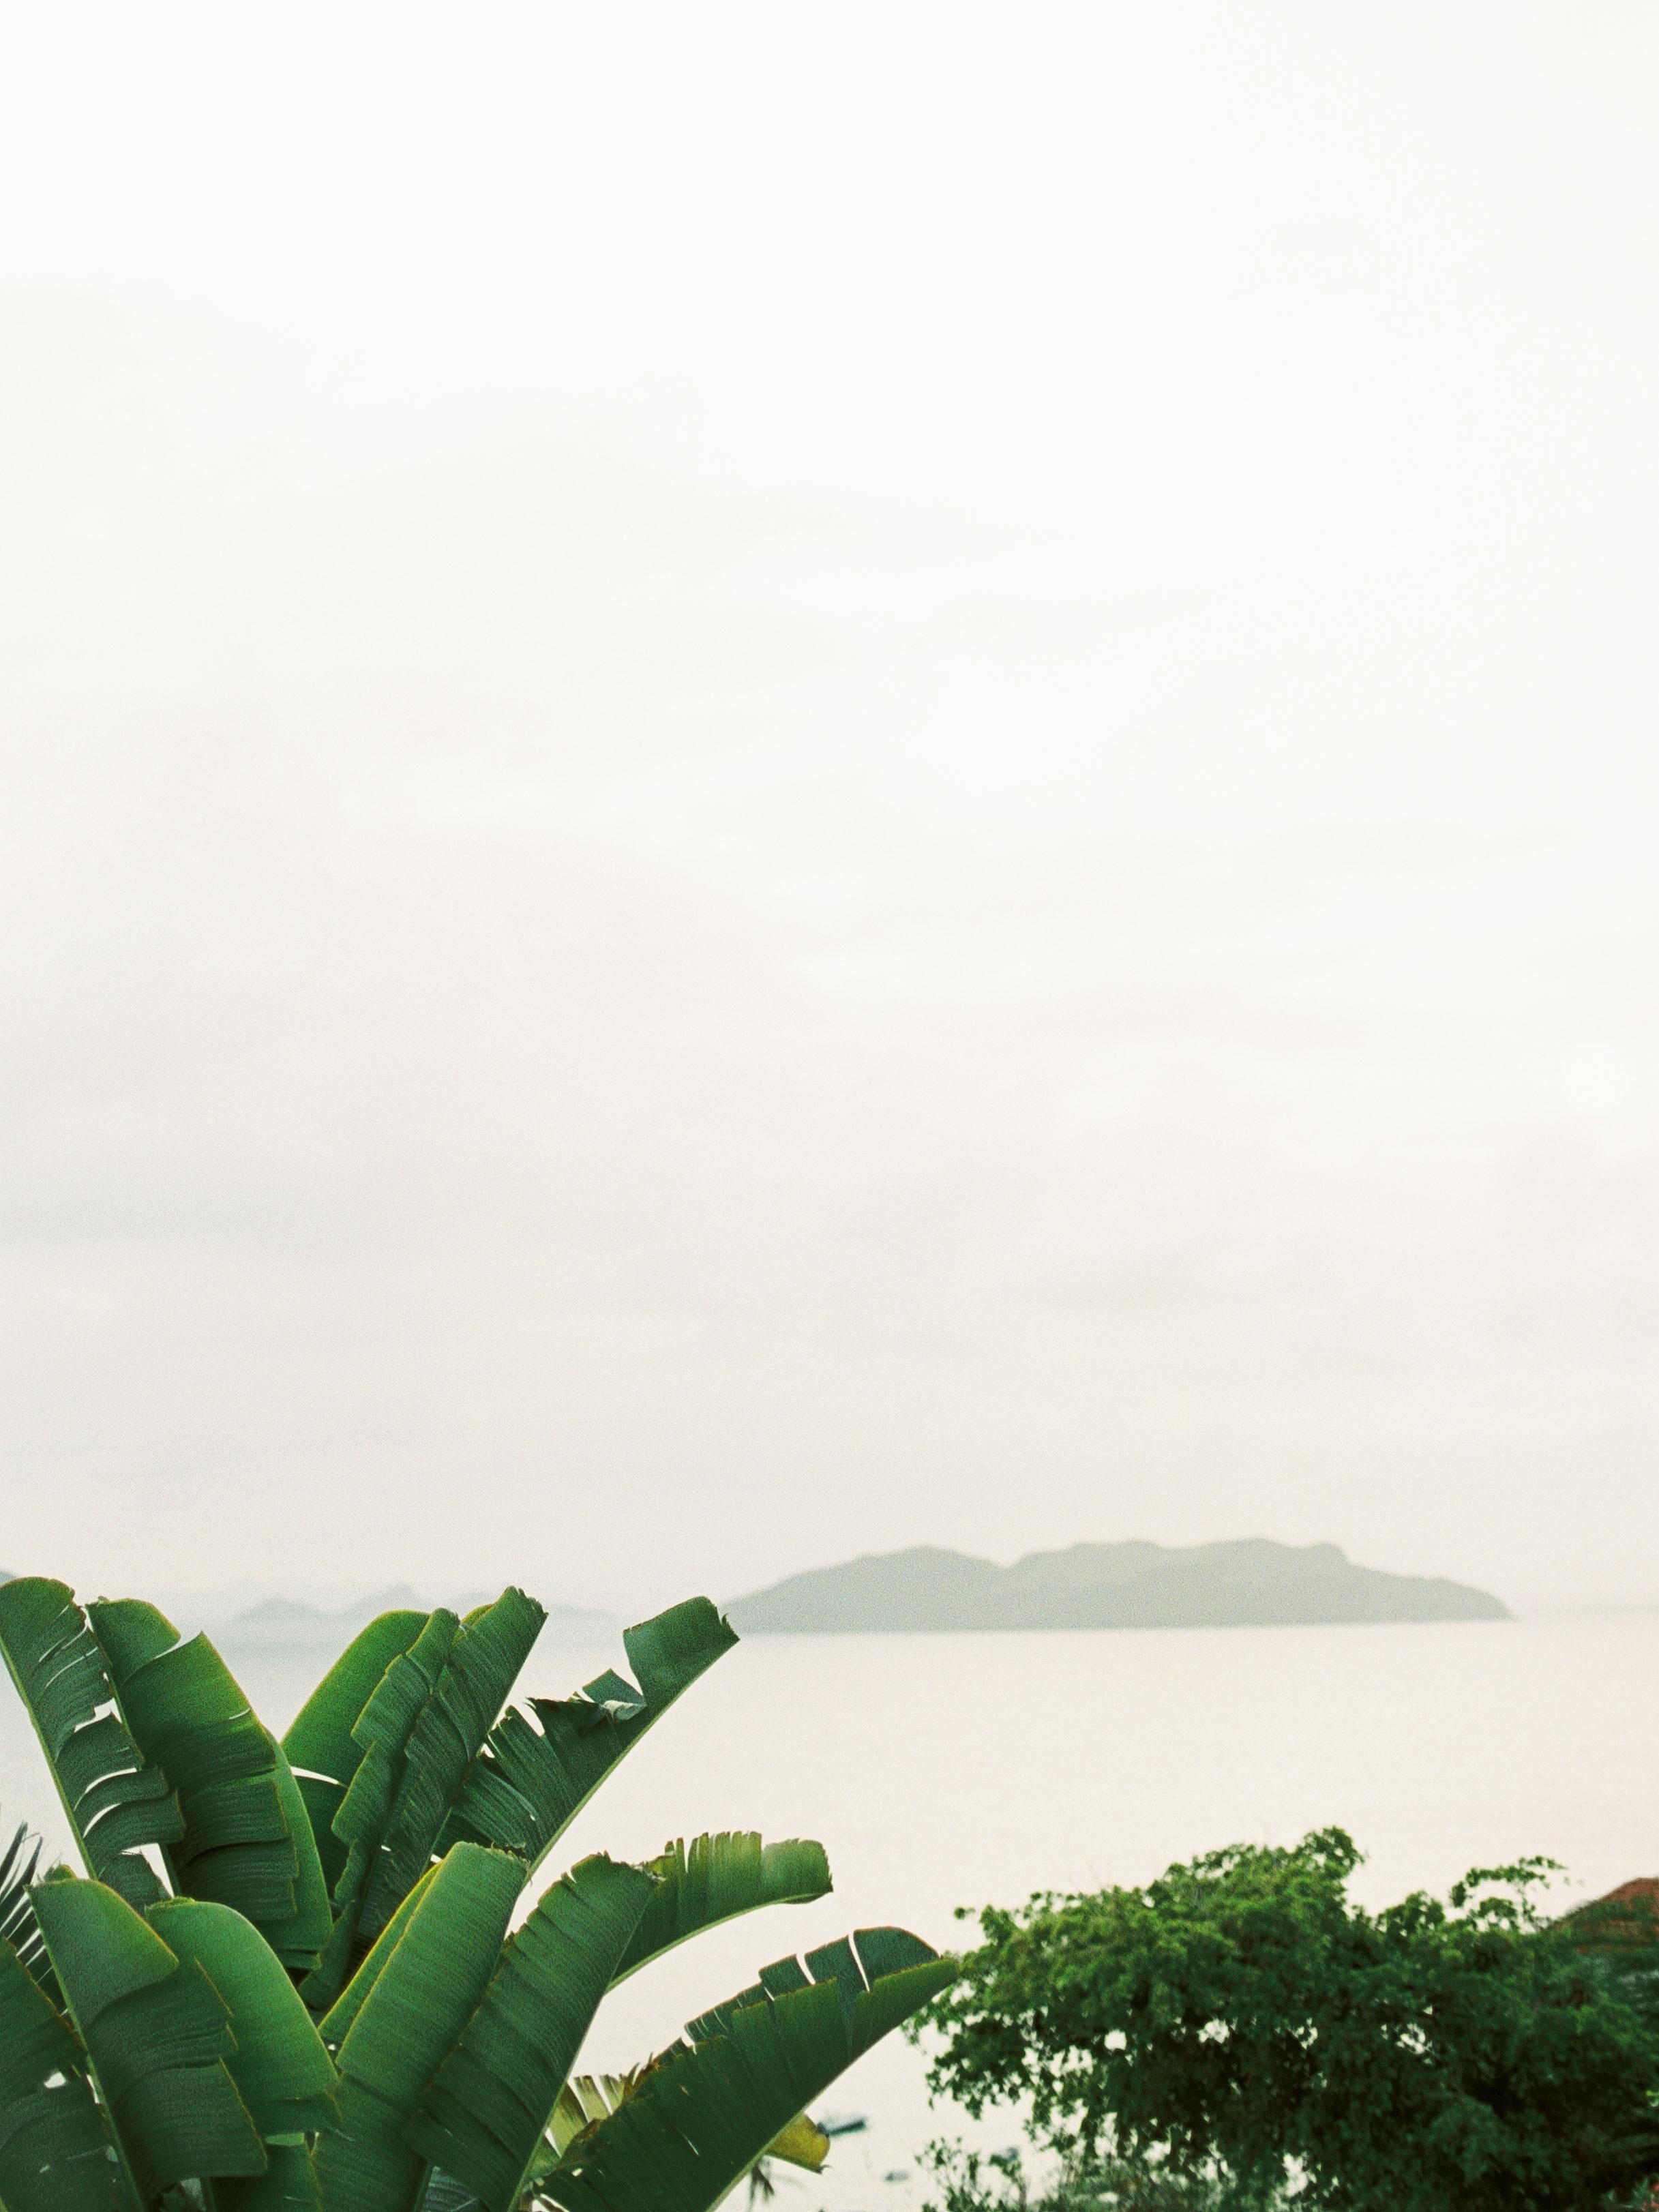 St. Barth's Vacation Travel Blog - Rachel Owens Photography -41.jpg